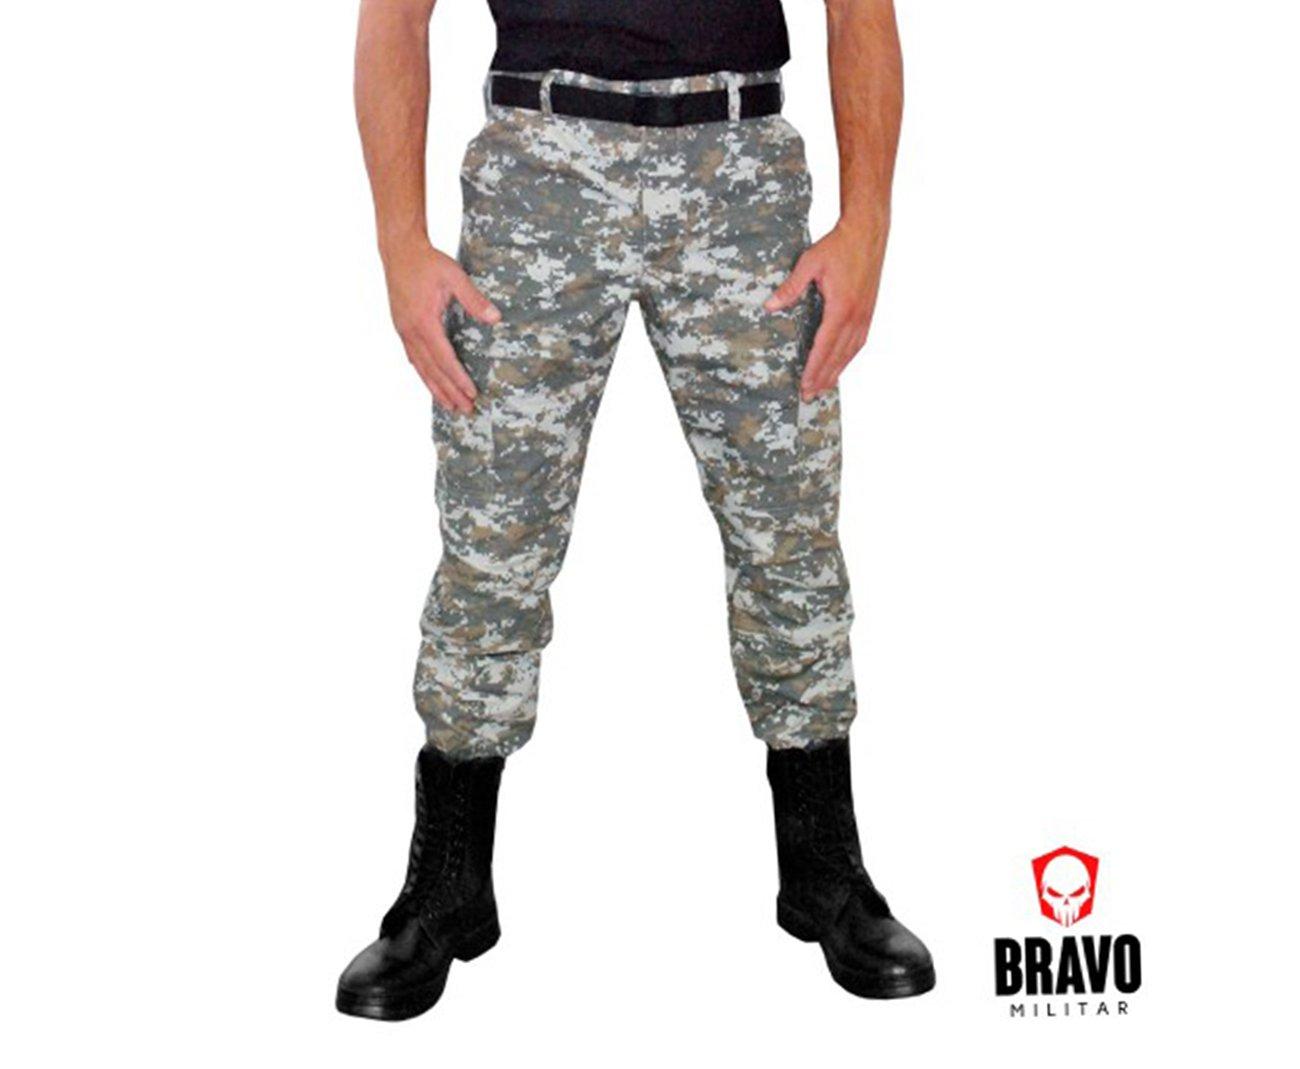 Calça Tatica Camuflada Army Combat Camuflado Digital - Bravo